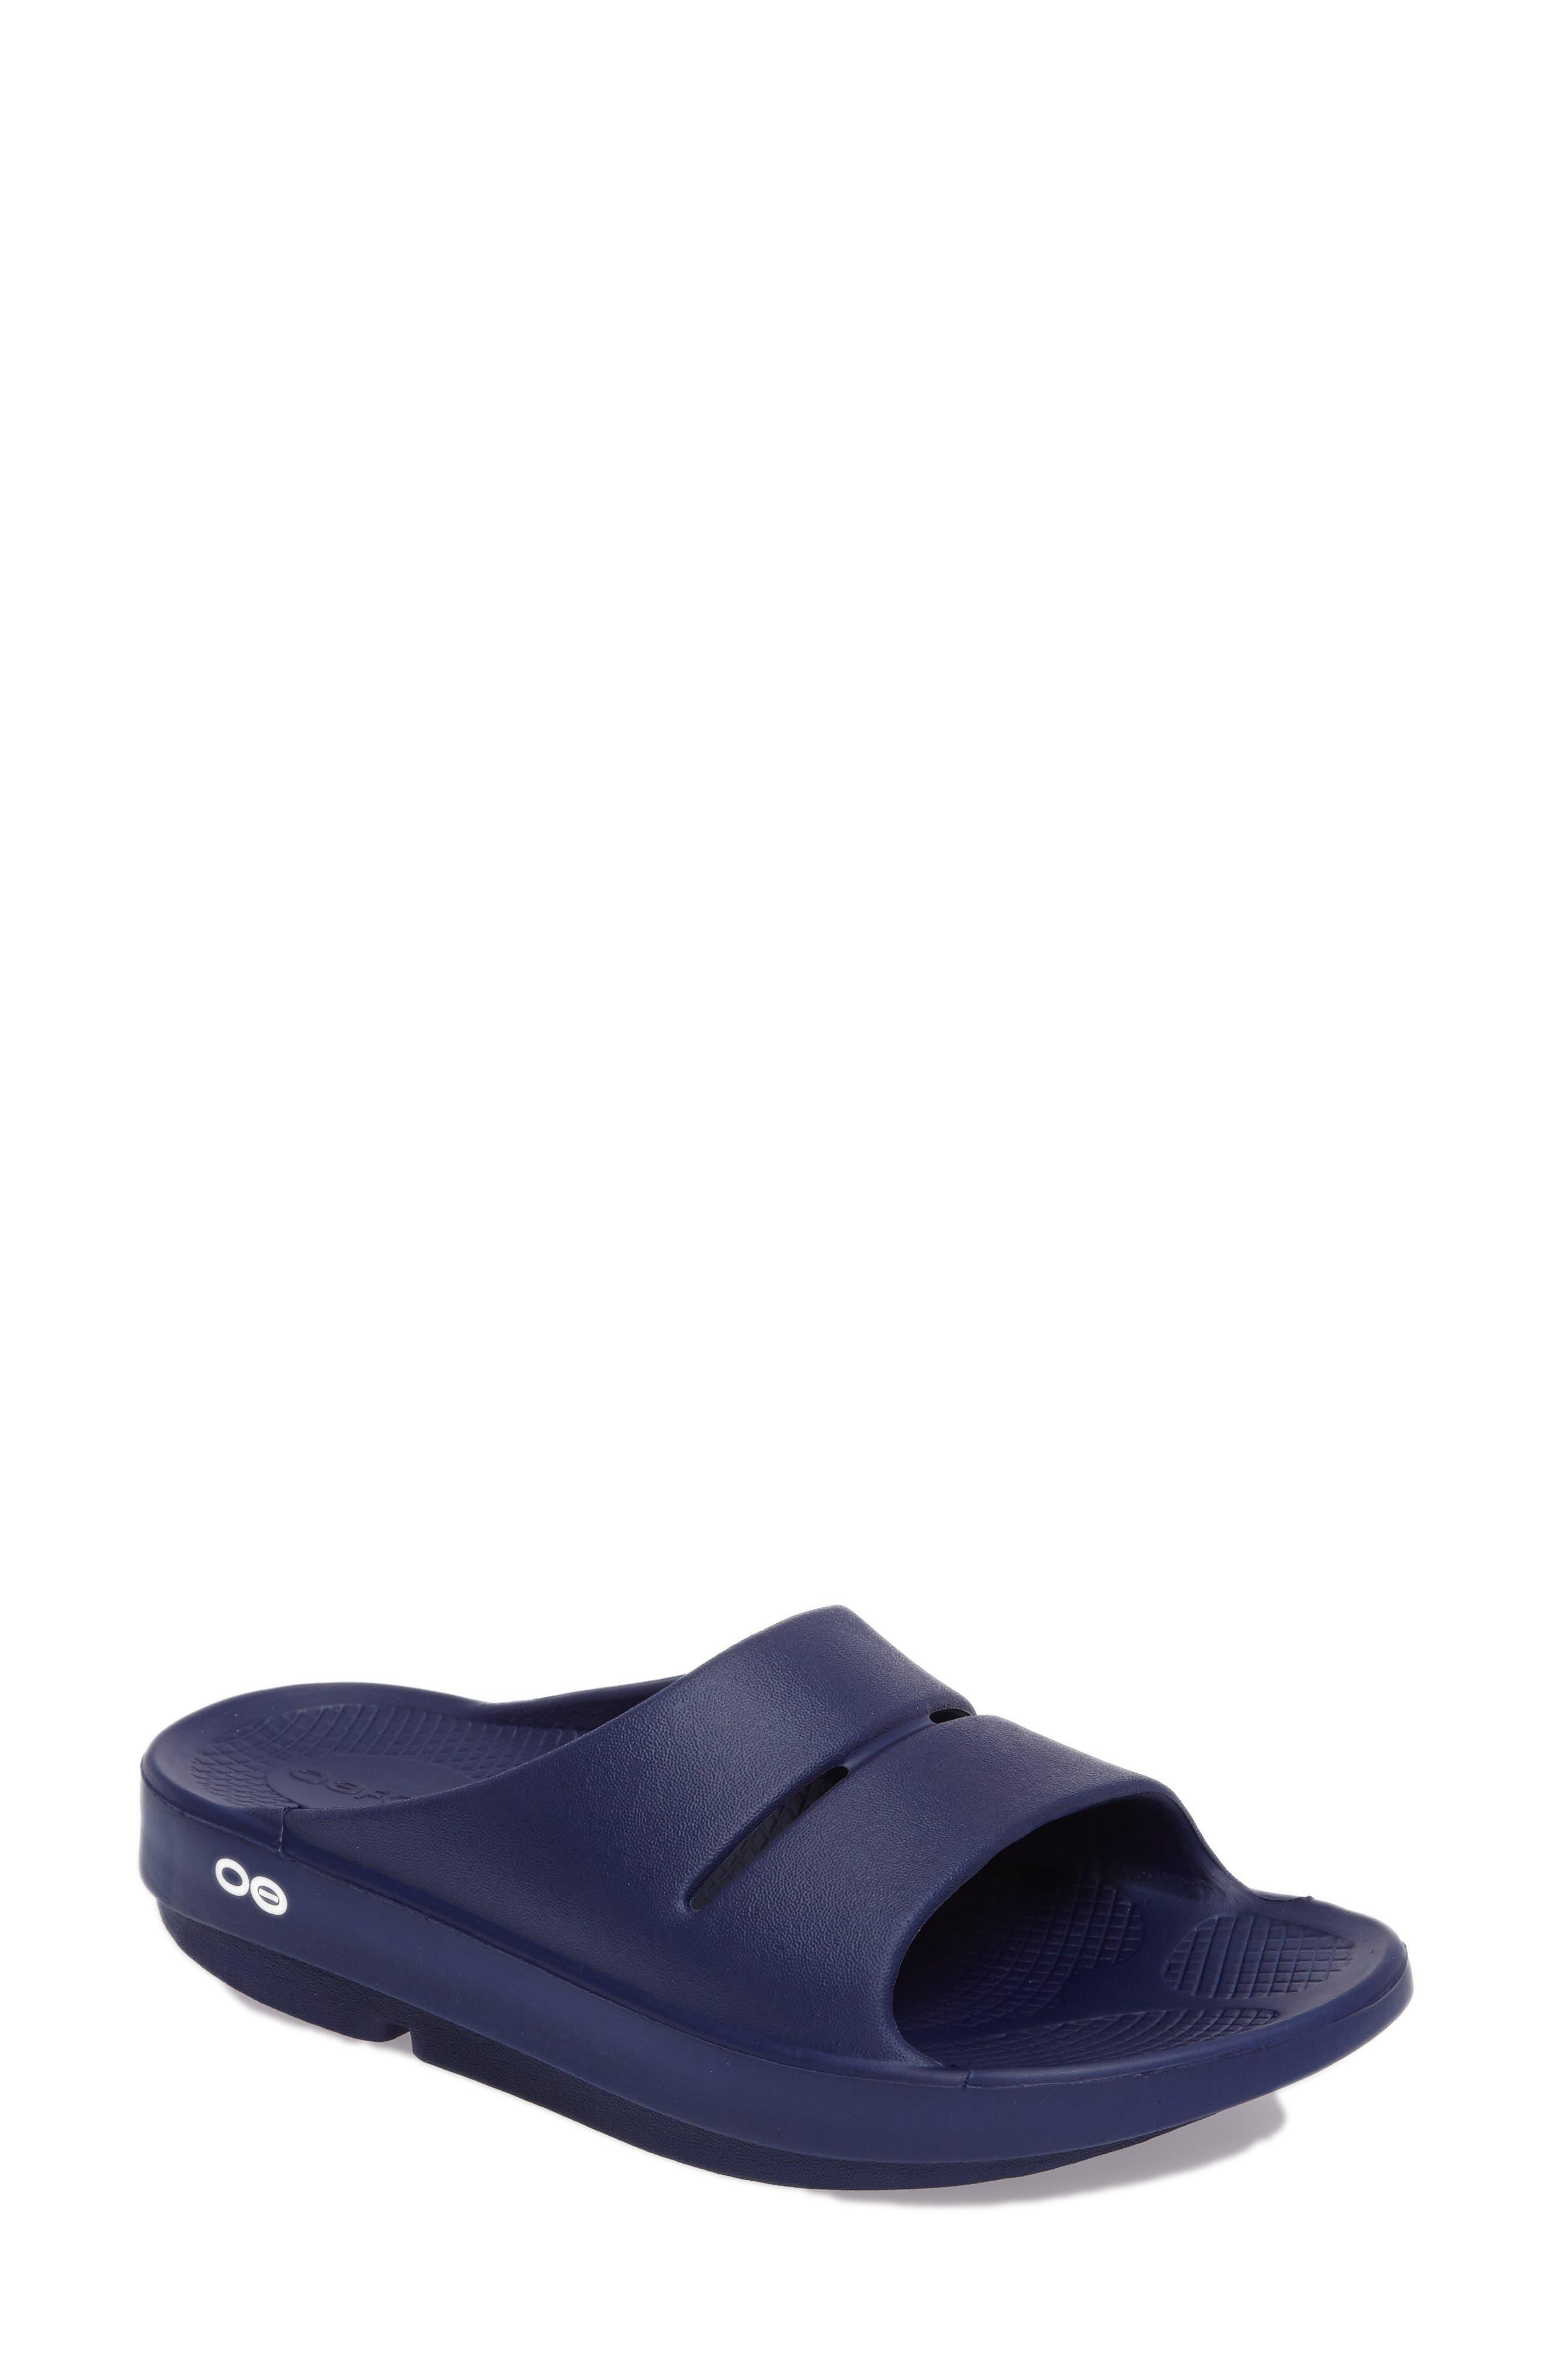 Oofos OOahh Slide Sandal (Women)